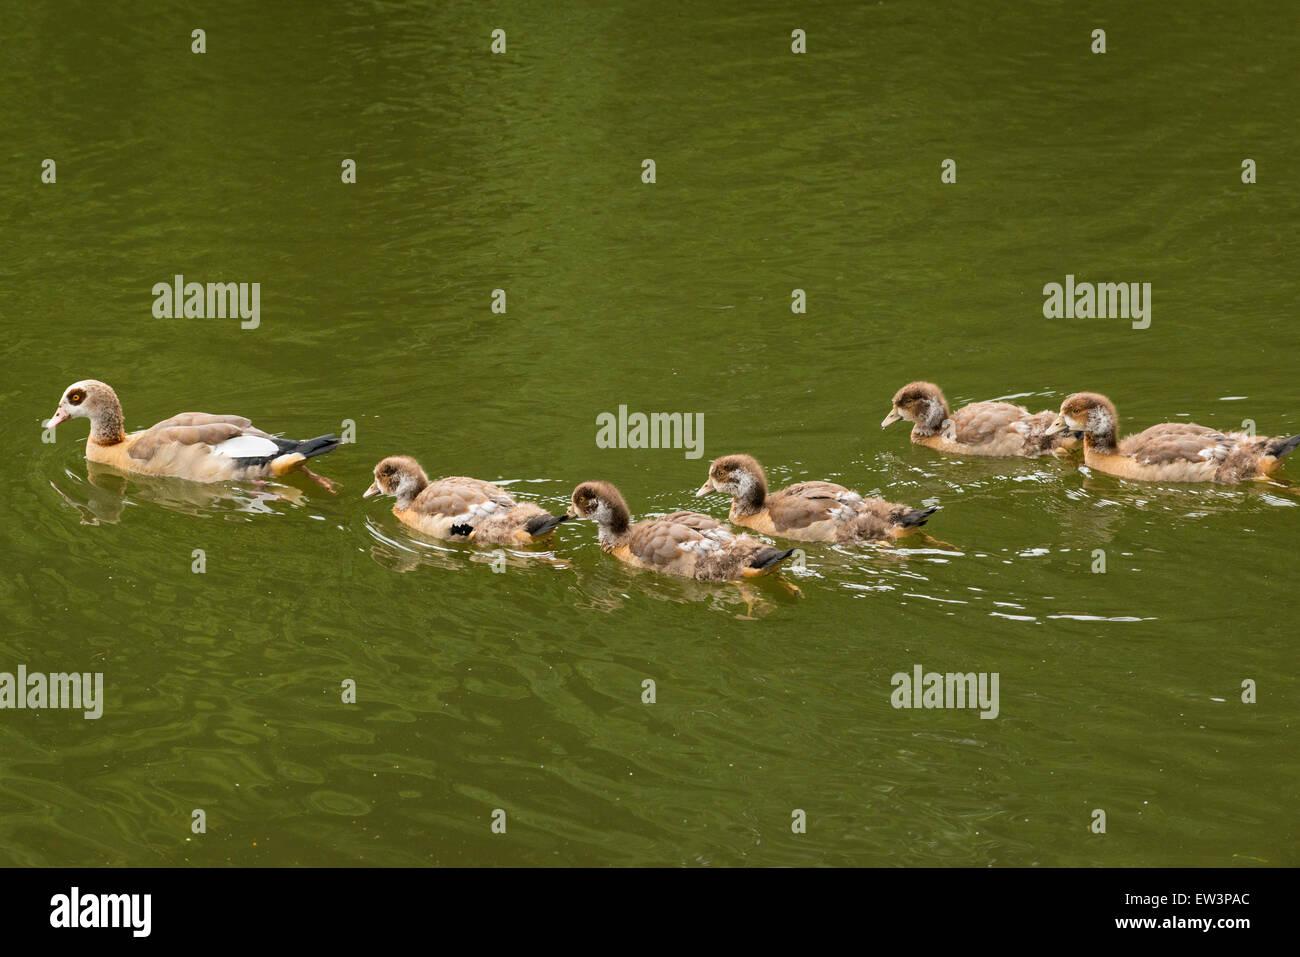 North West London Kenwood House Hampstead Heath wildlife nature park reserve woodland scene goose geese gosling - Stock Image